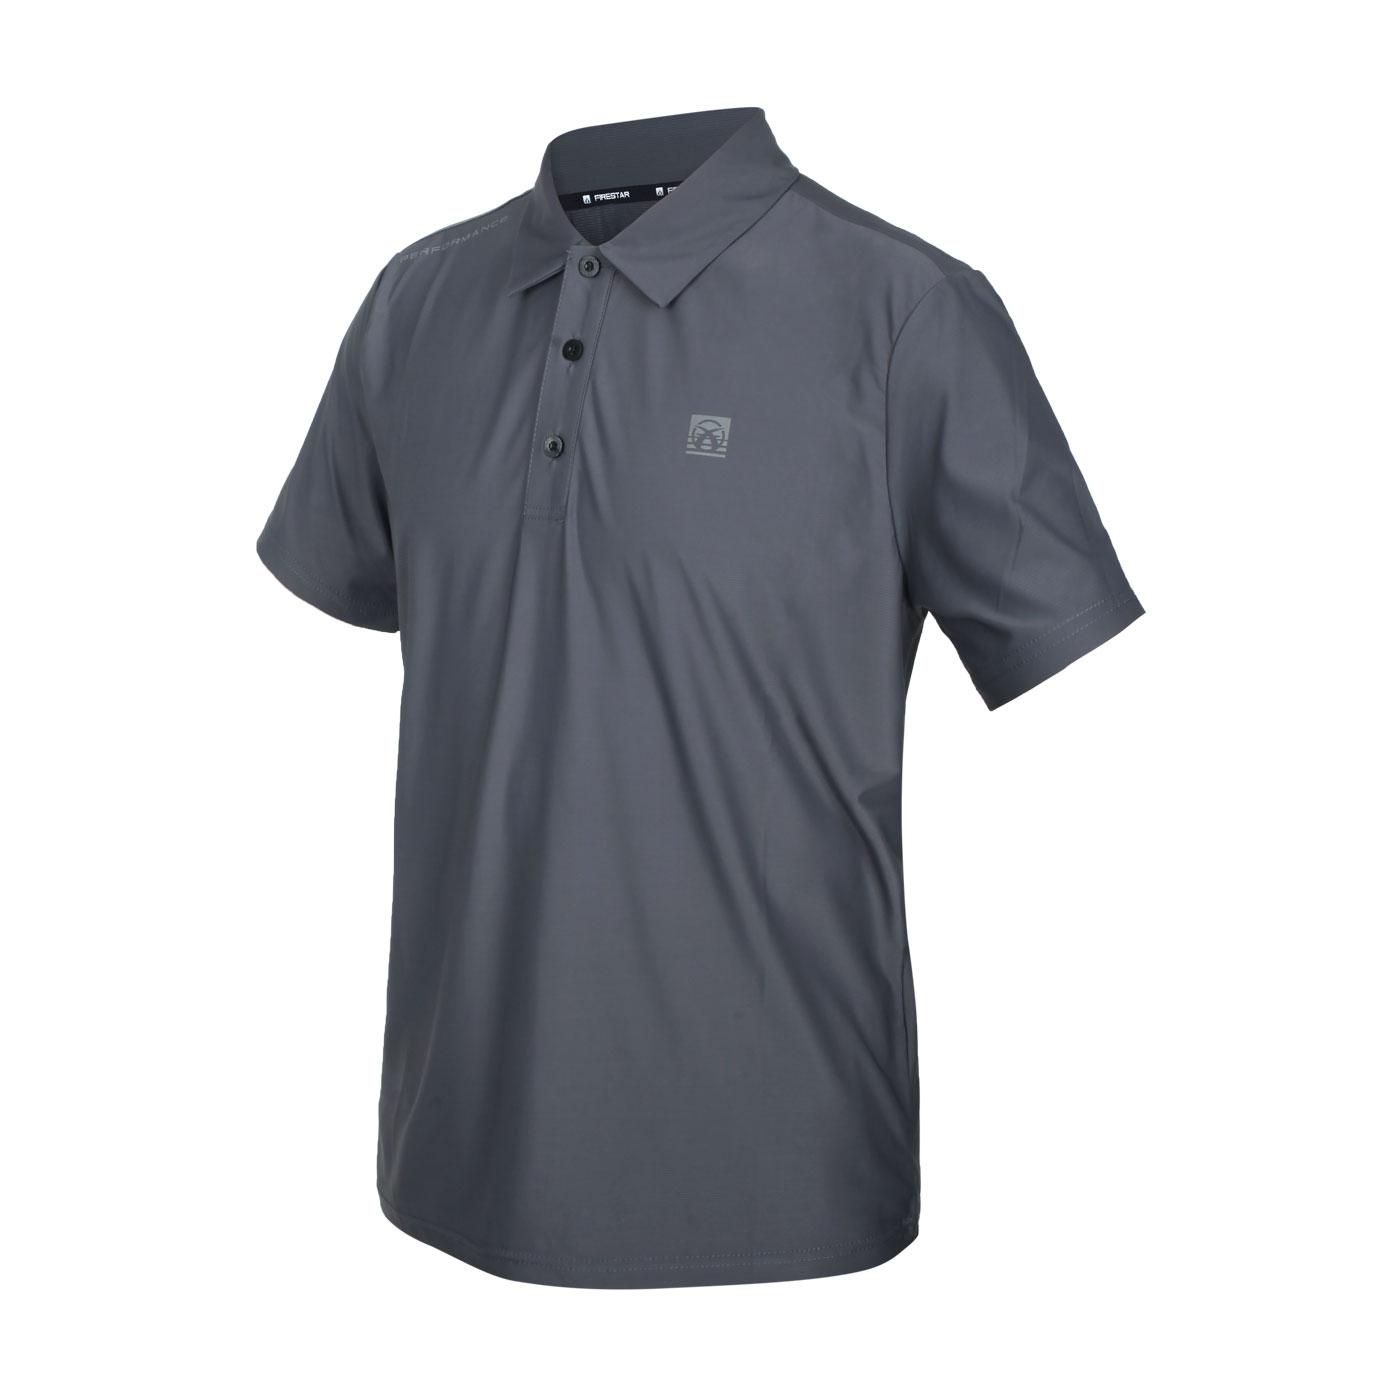 FIRESTAR 男款彈性高爾夫短袖POLO衫 D1752-15